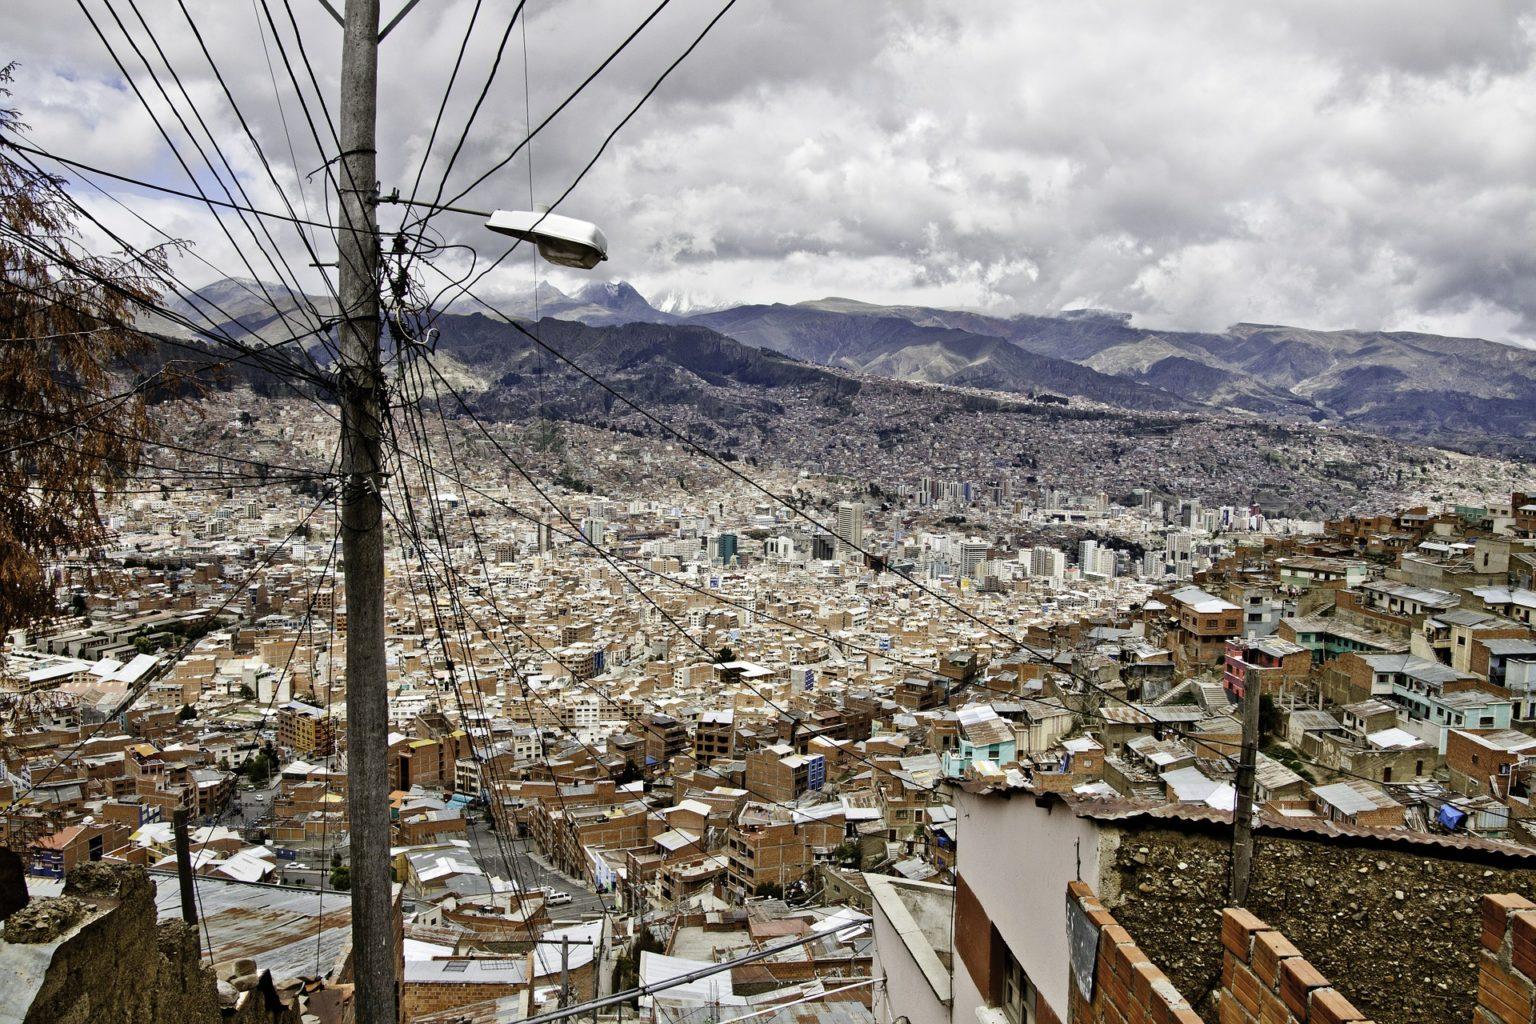 Walking tour in La Paz